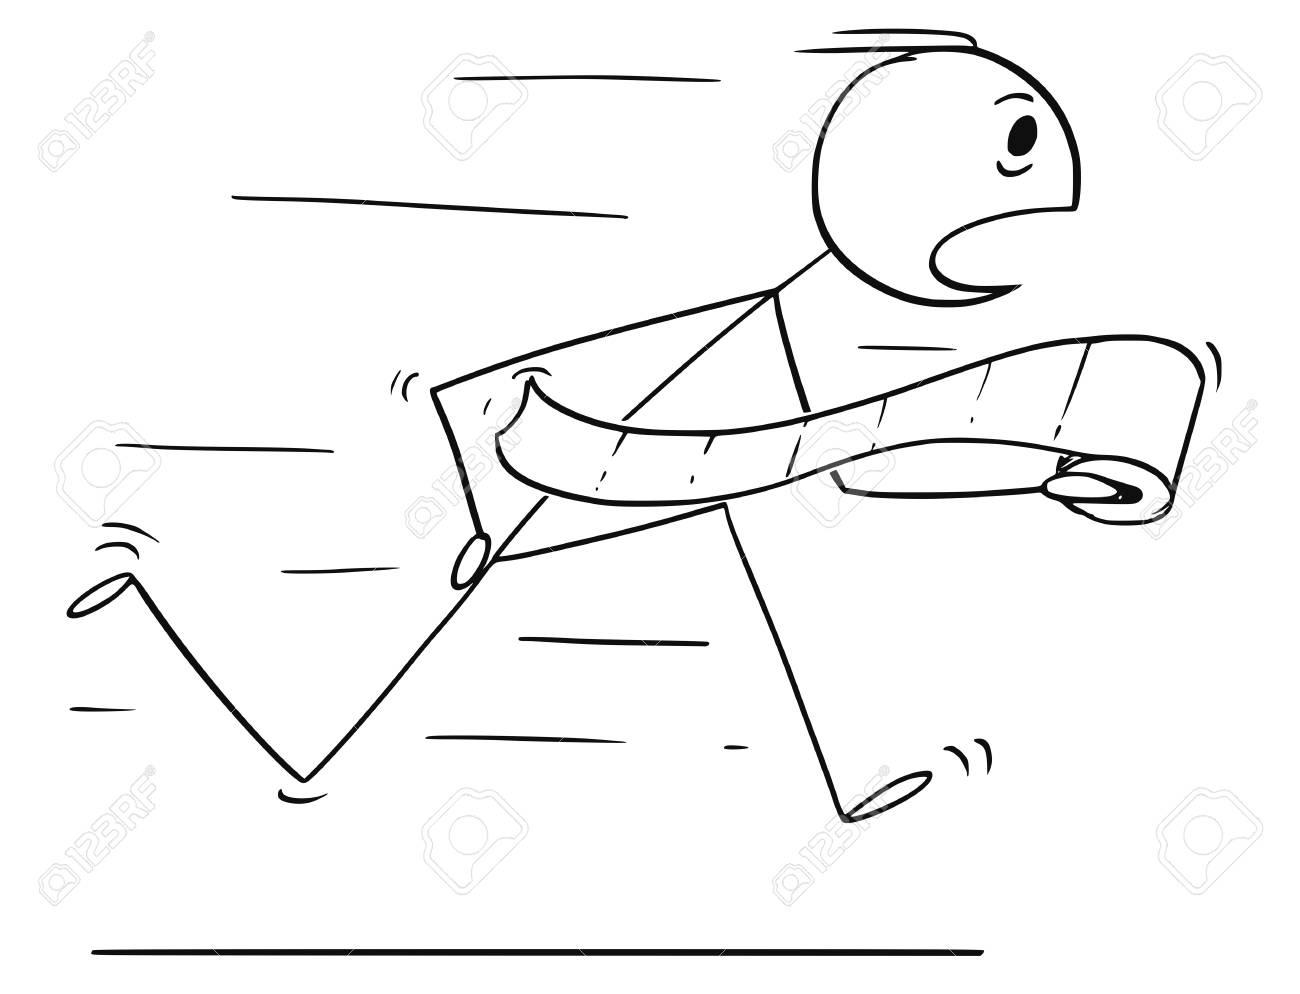 Cartoon Stick Drawing Conceptual Illustration Of Man Running Stock